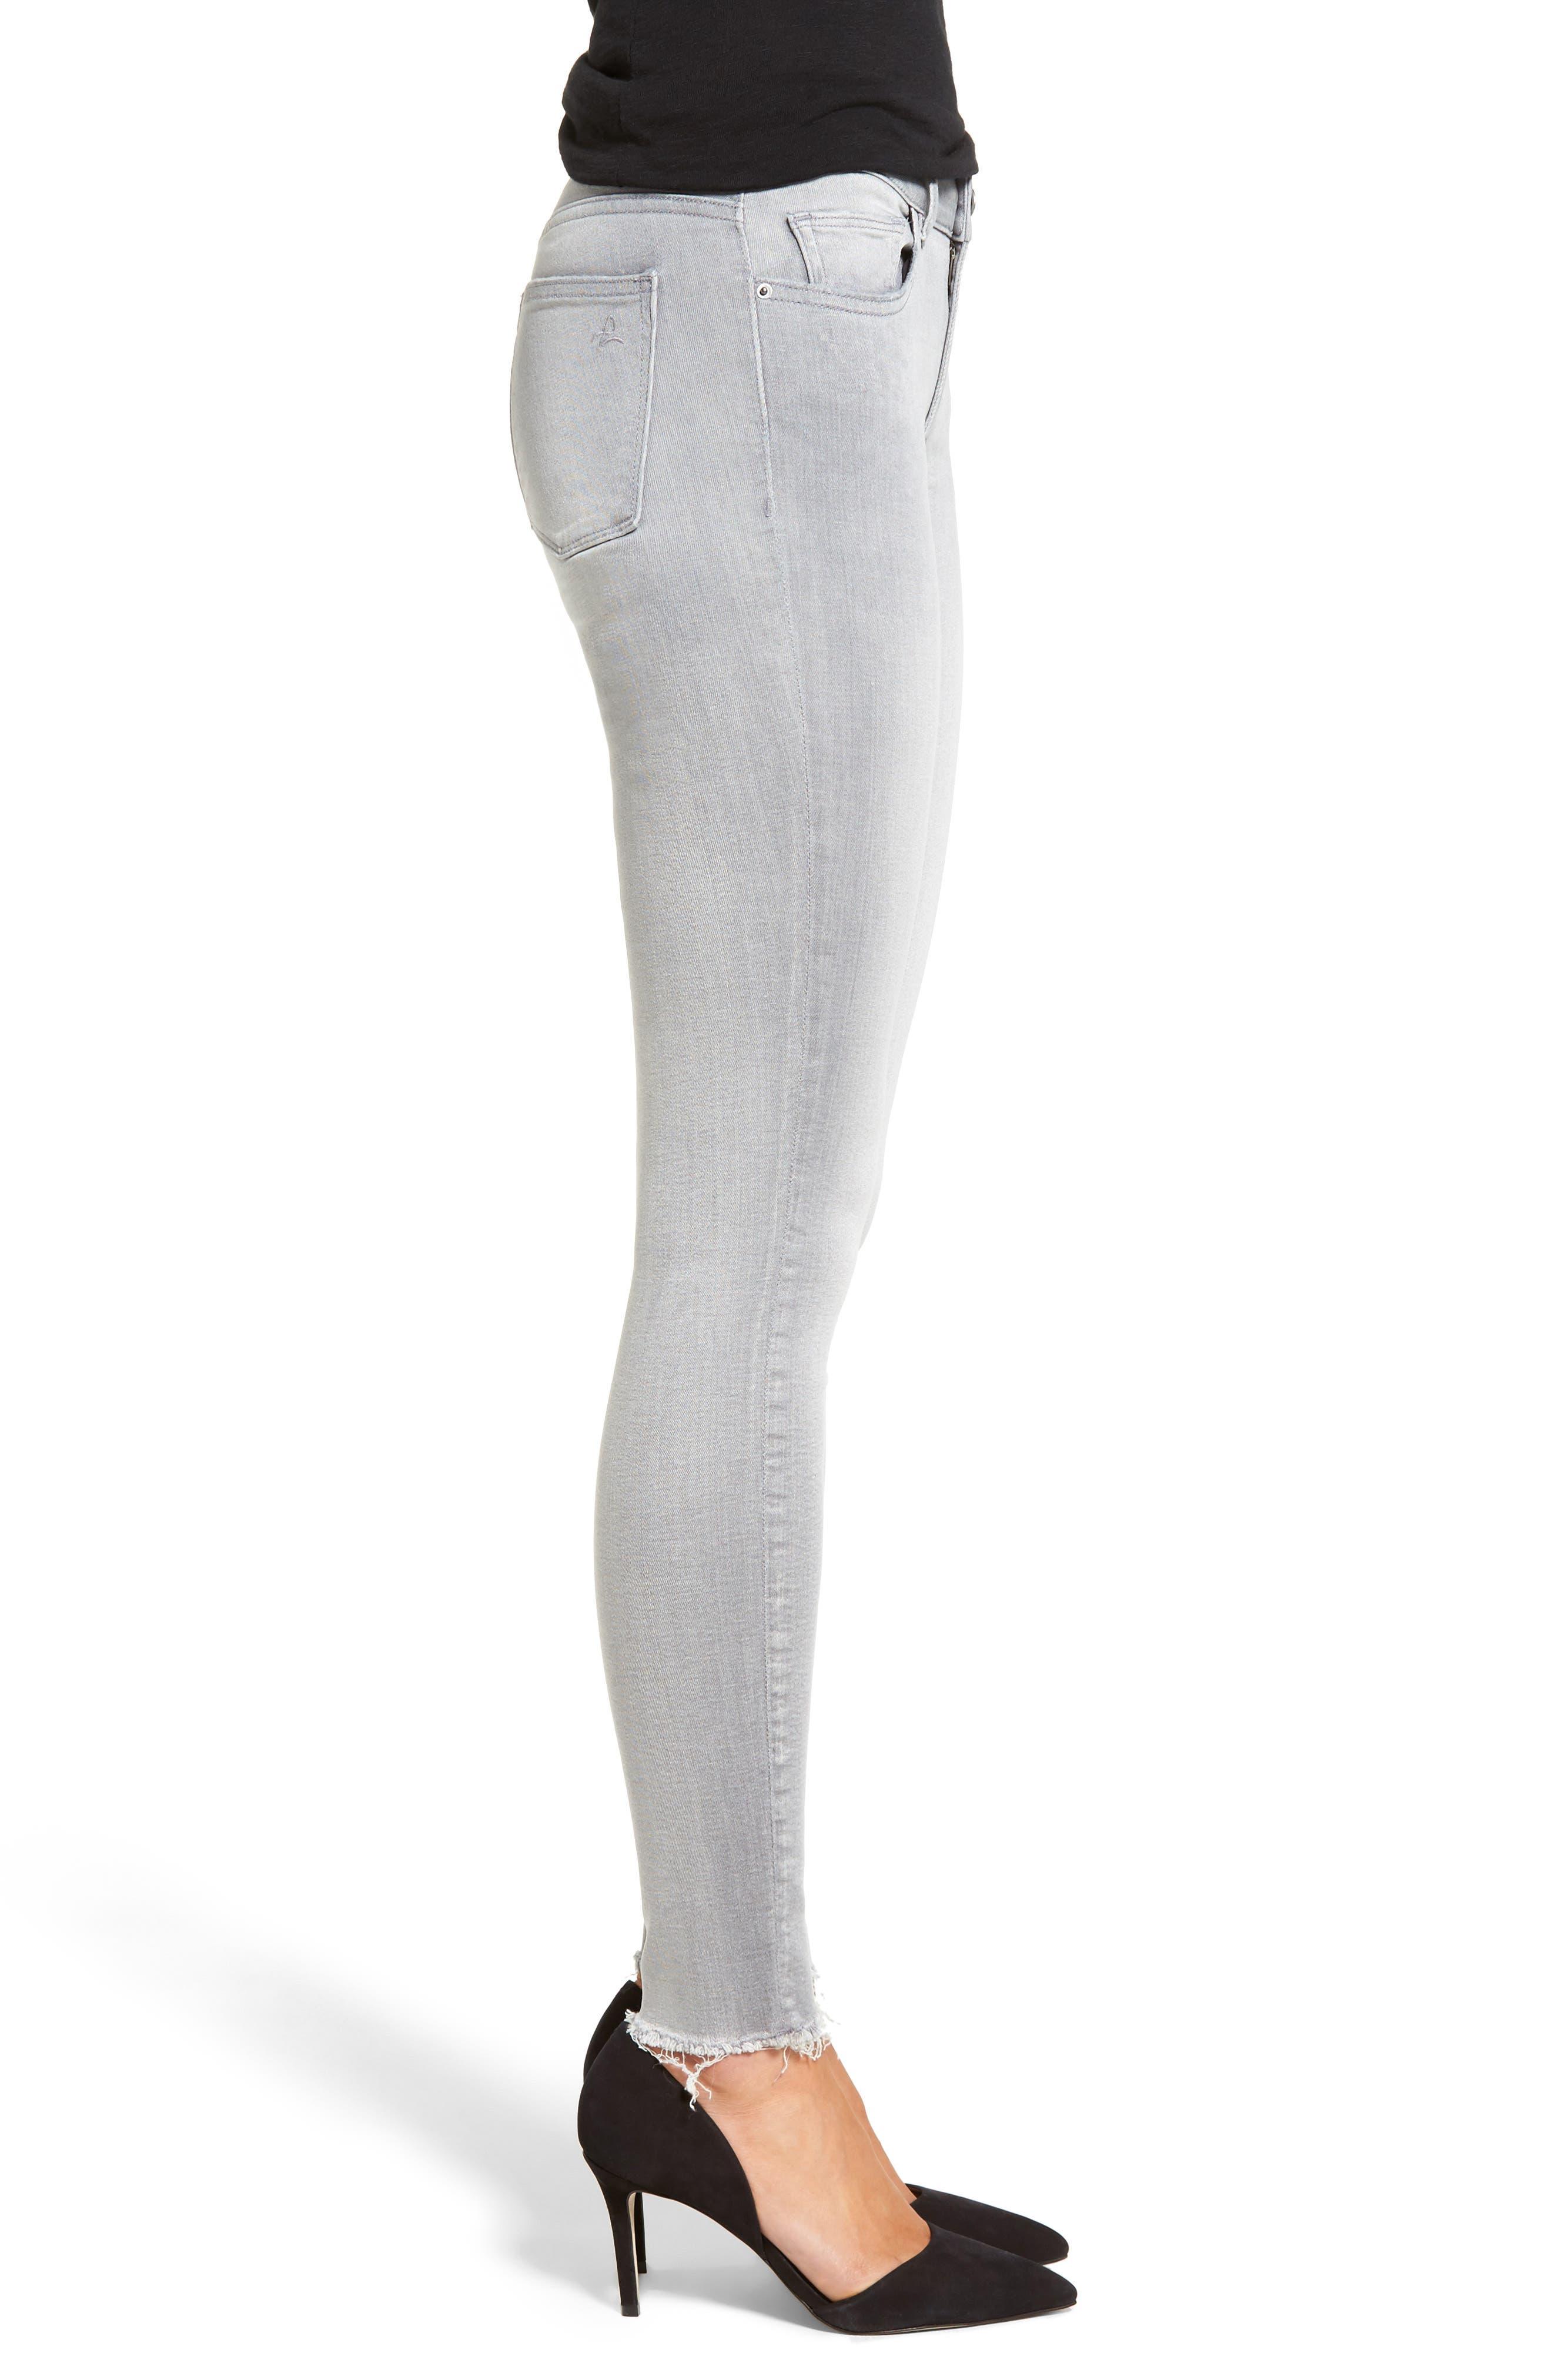 Emma Power Legging Jeans,                             Alternate thumbnail 3, color,                             020